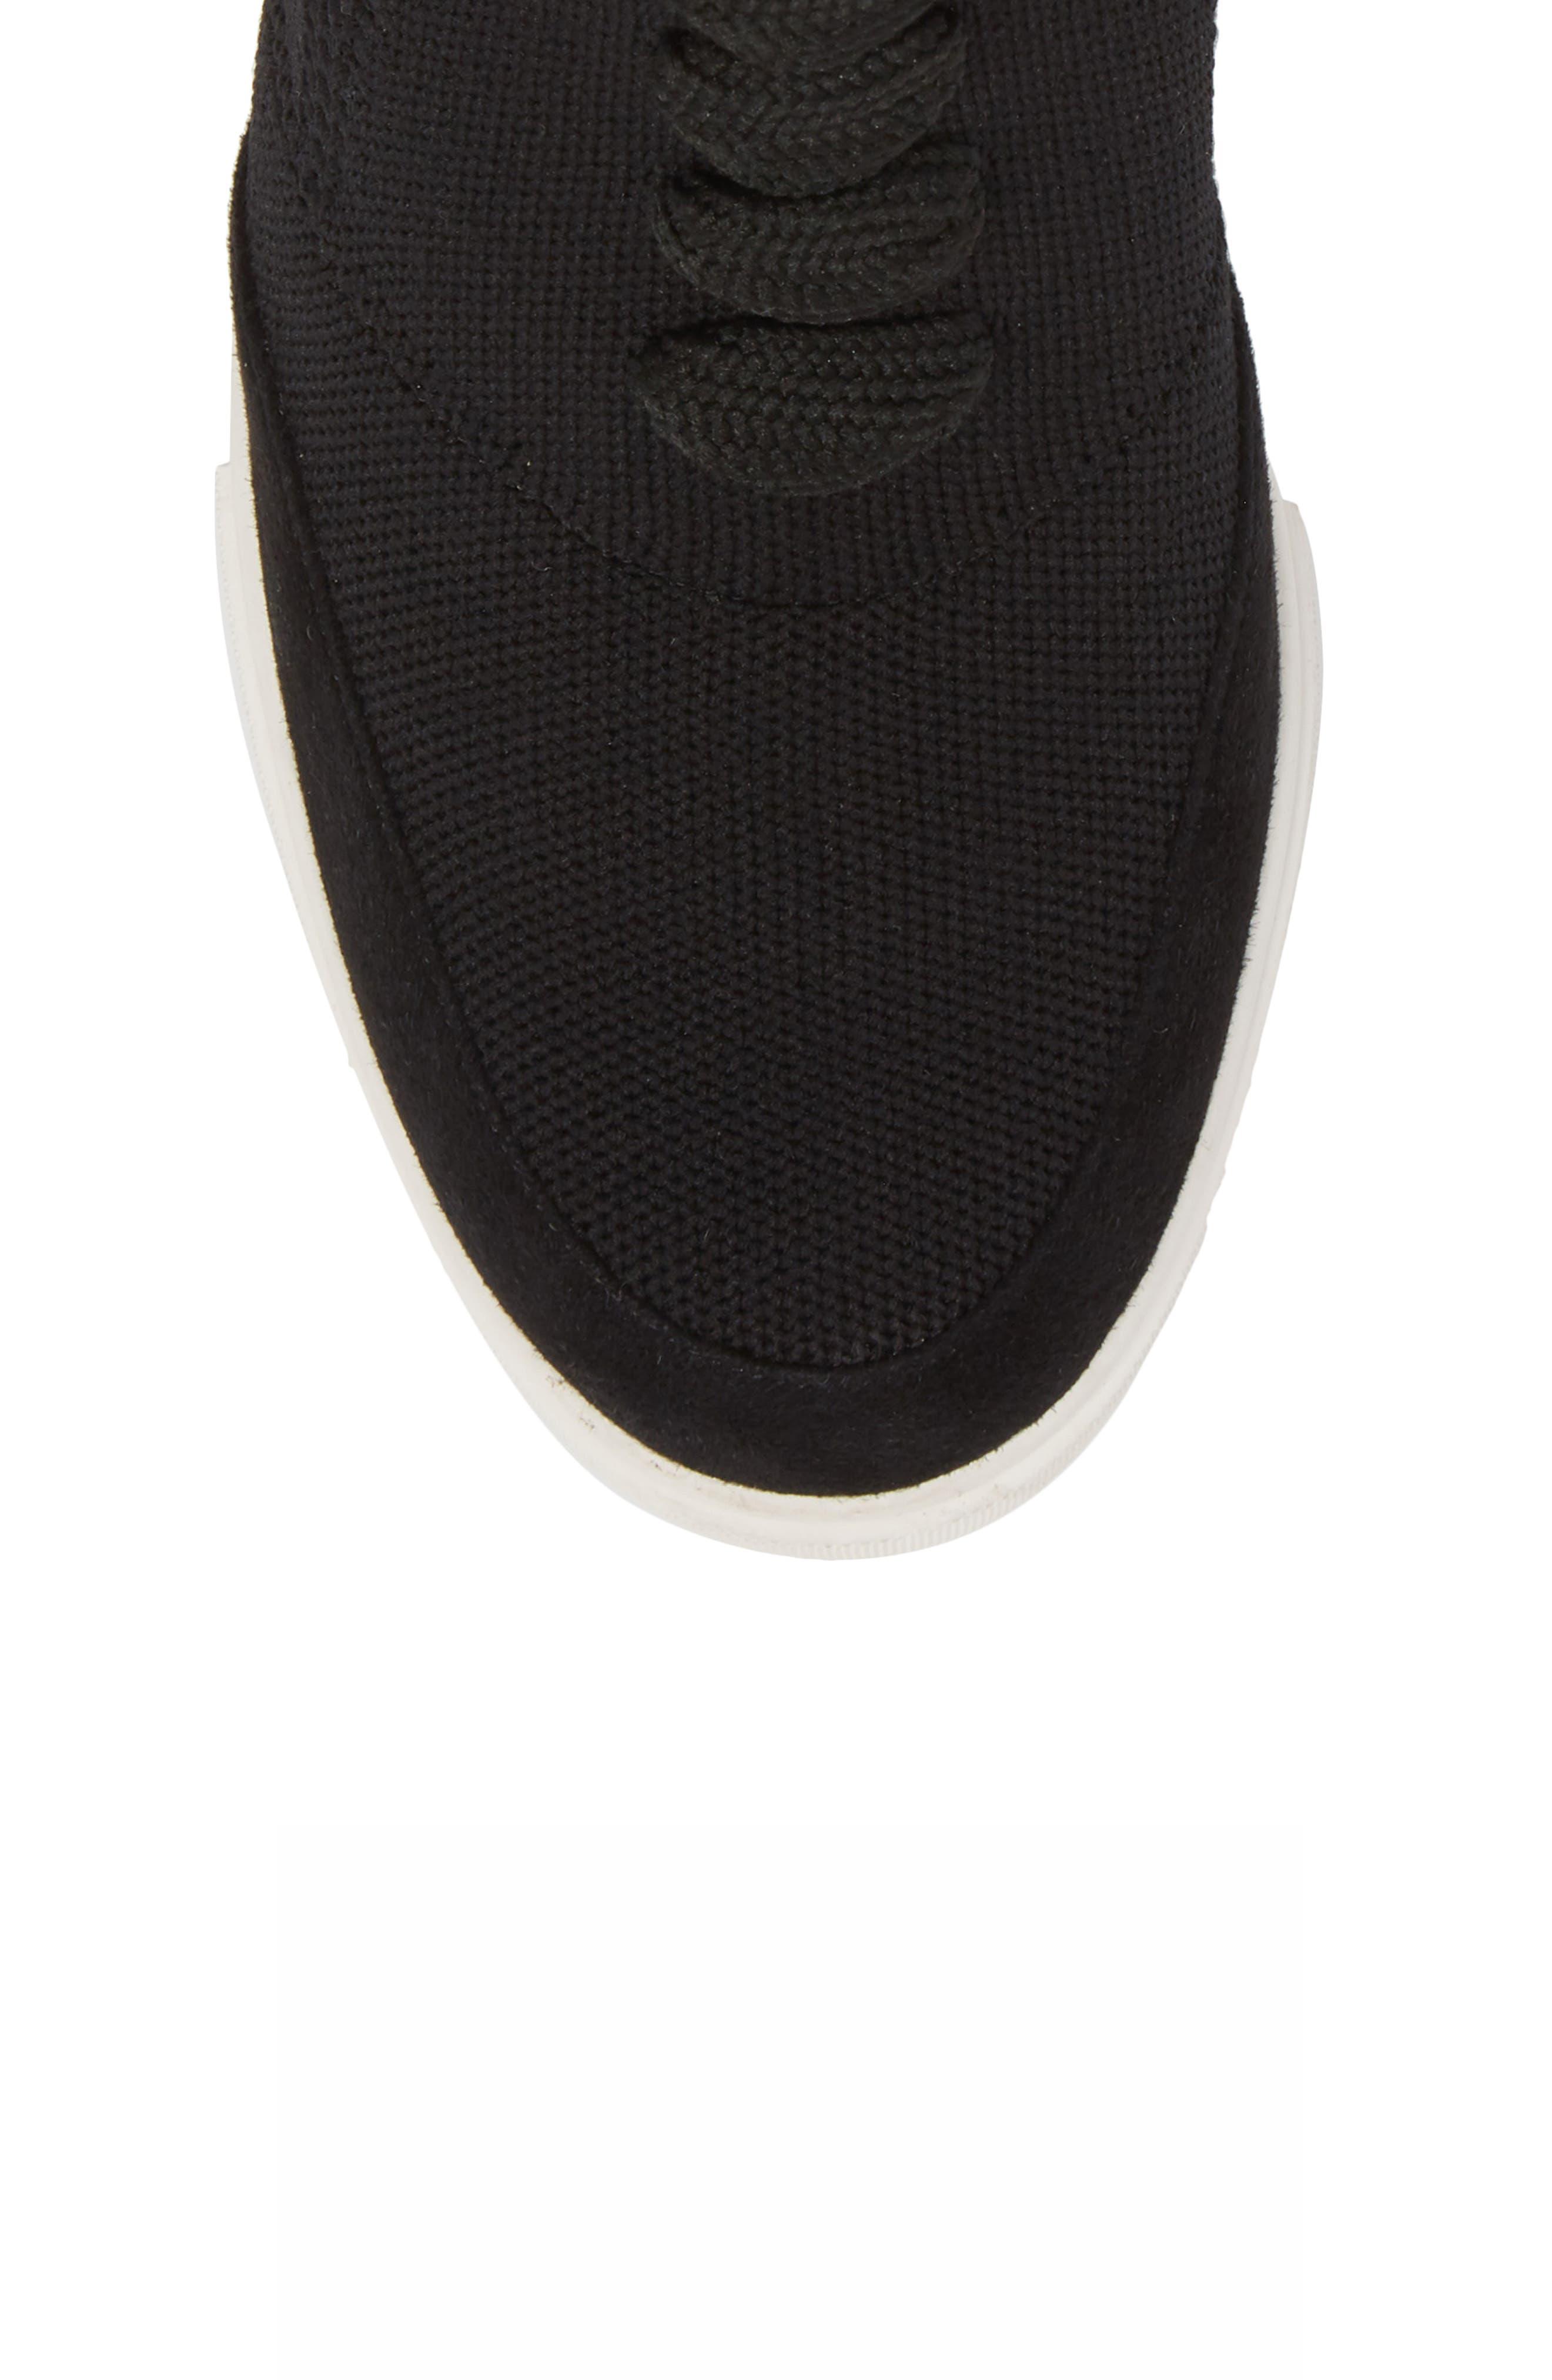 Fabiana Wedge Sneaker,                             Alternate thumbnail 5, color,                             BLACK SUEDE